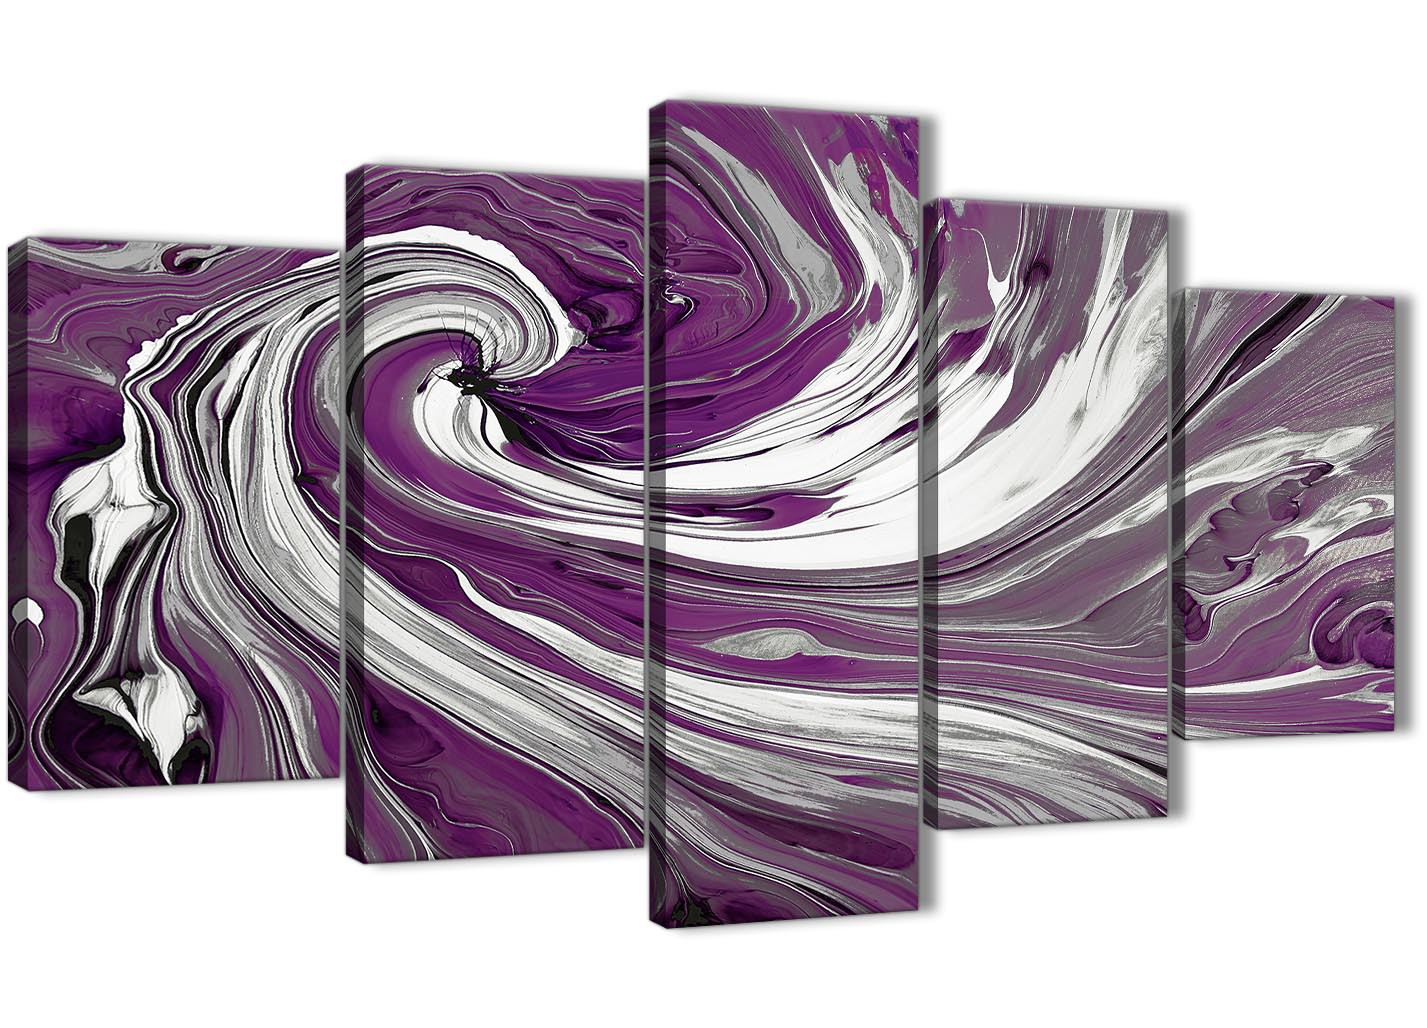 Extra Large Purple White Swirls Modern Abstract Canvas